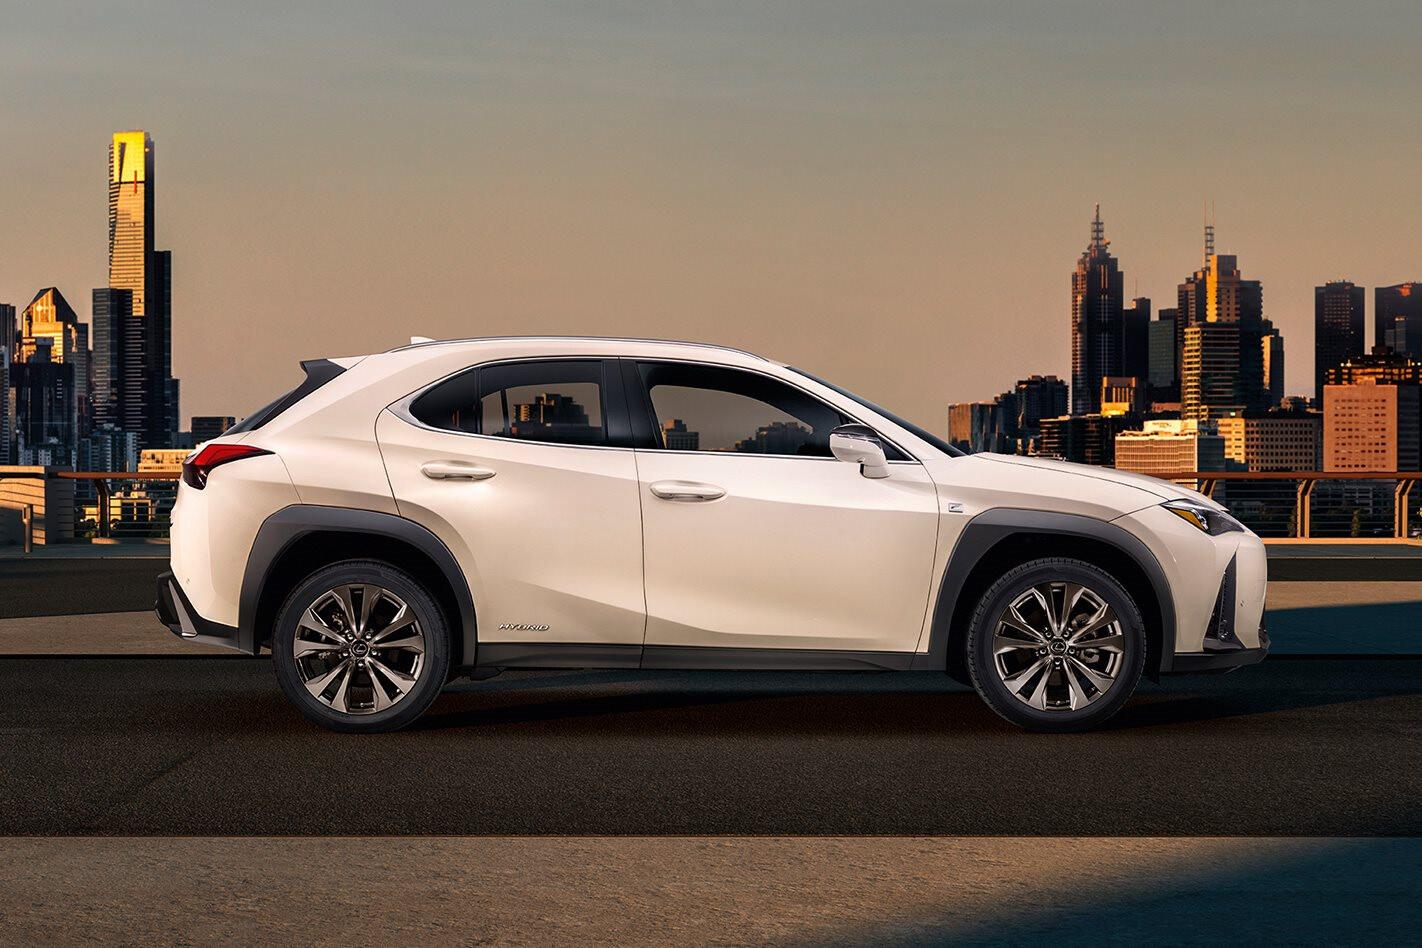 2018 Geneva Motor Show Lexus reveals UX compact crossover